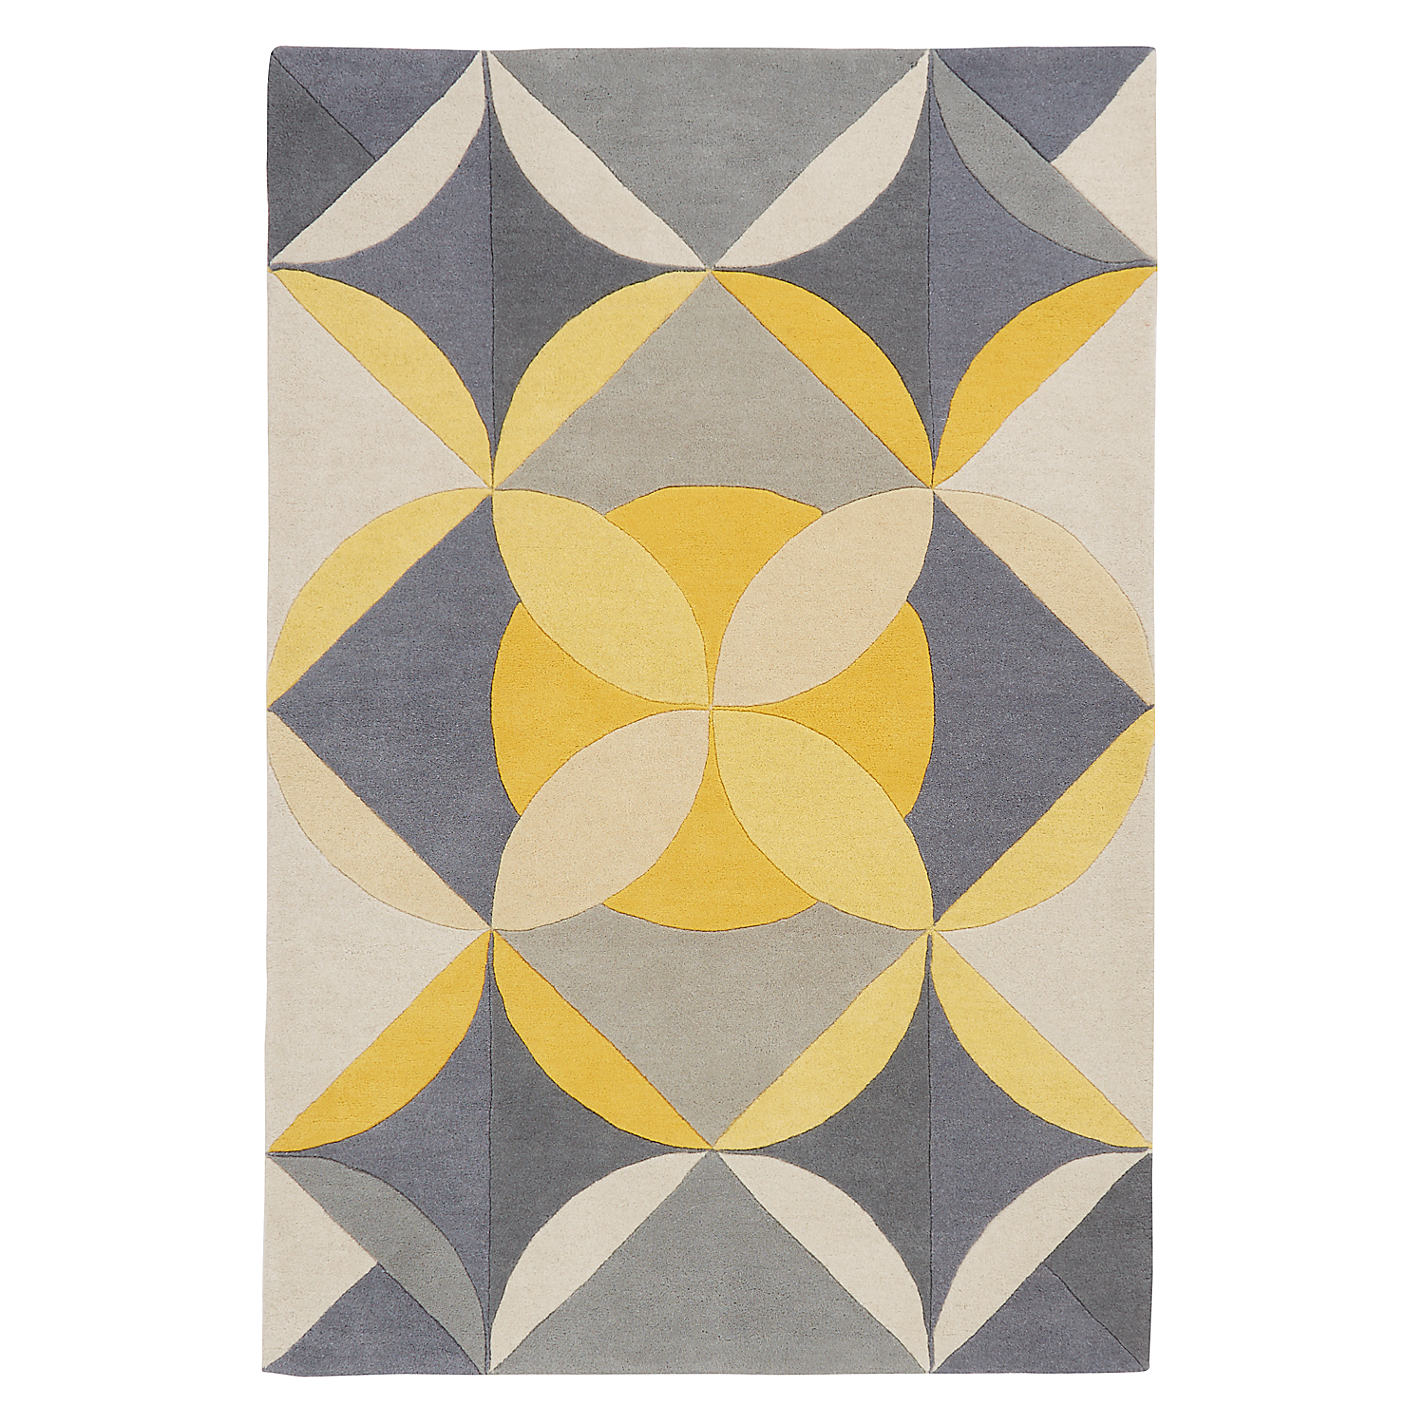 New tile collection by Lindsey Lang Design » Retail Design Blog